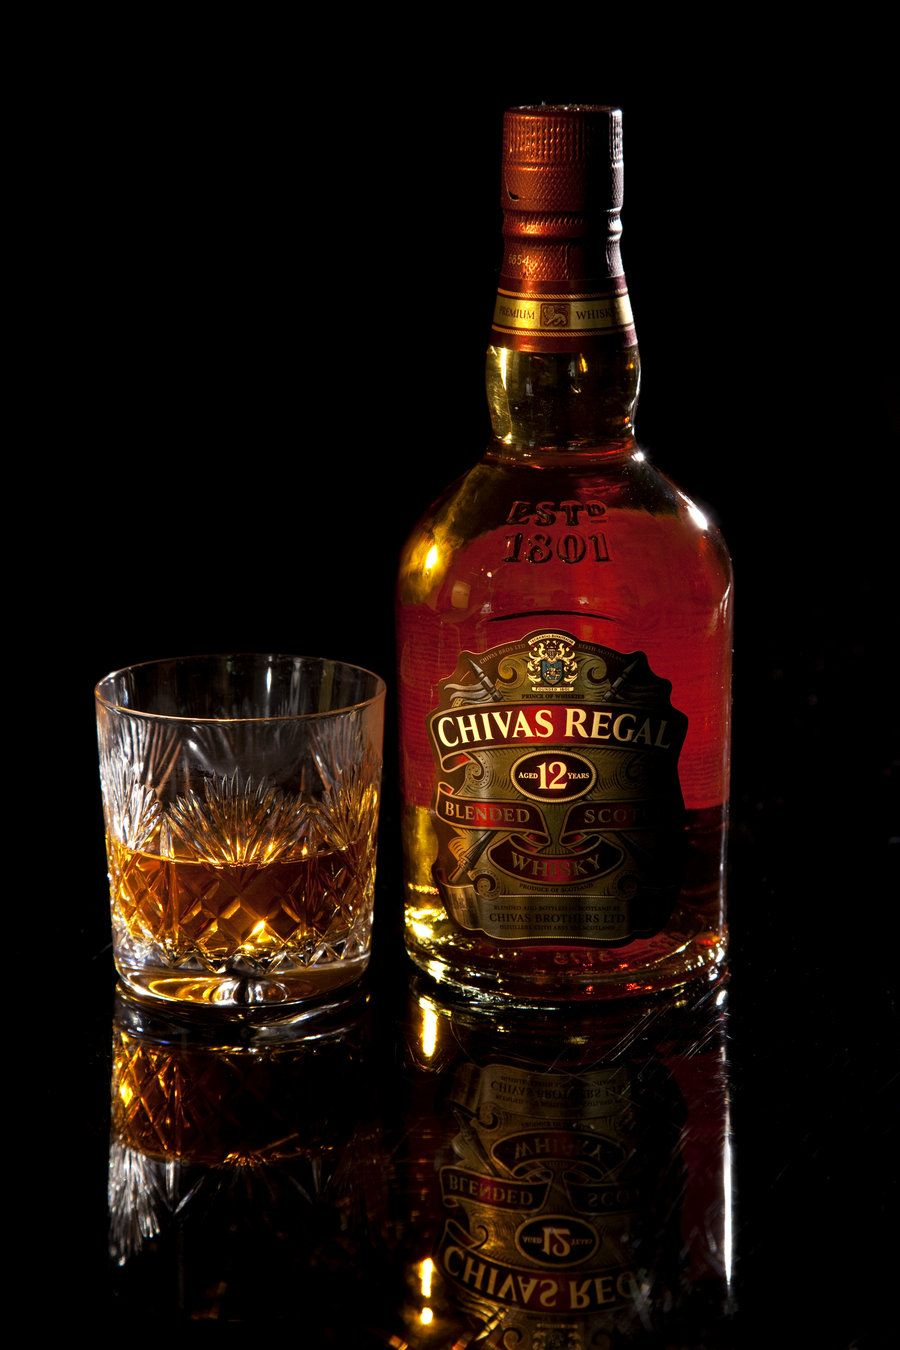 Chivas Regal Whiskeria Tequila Patron Licor